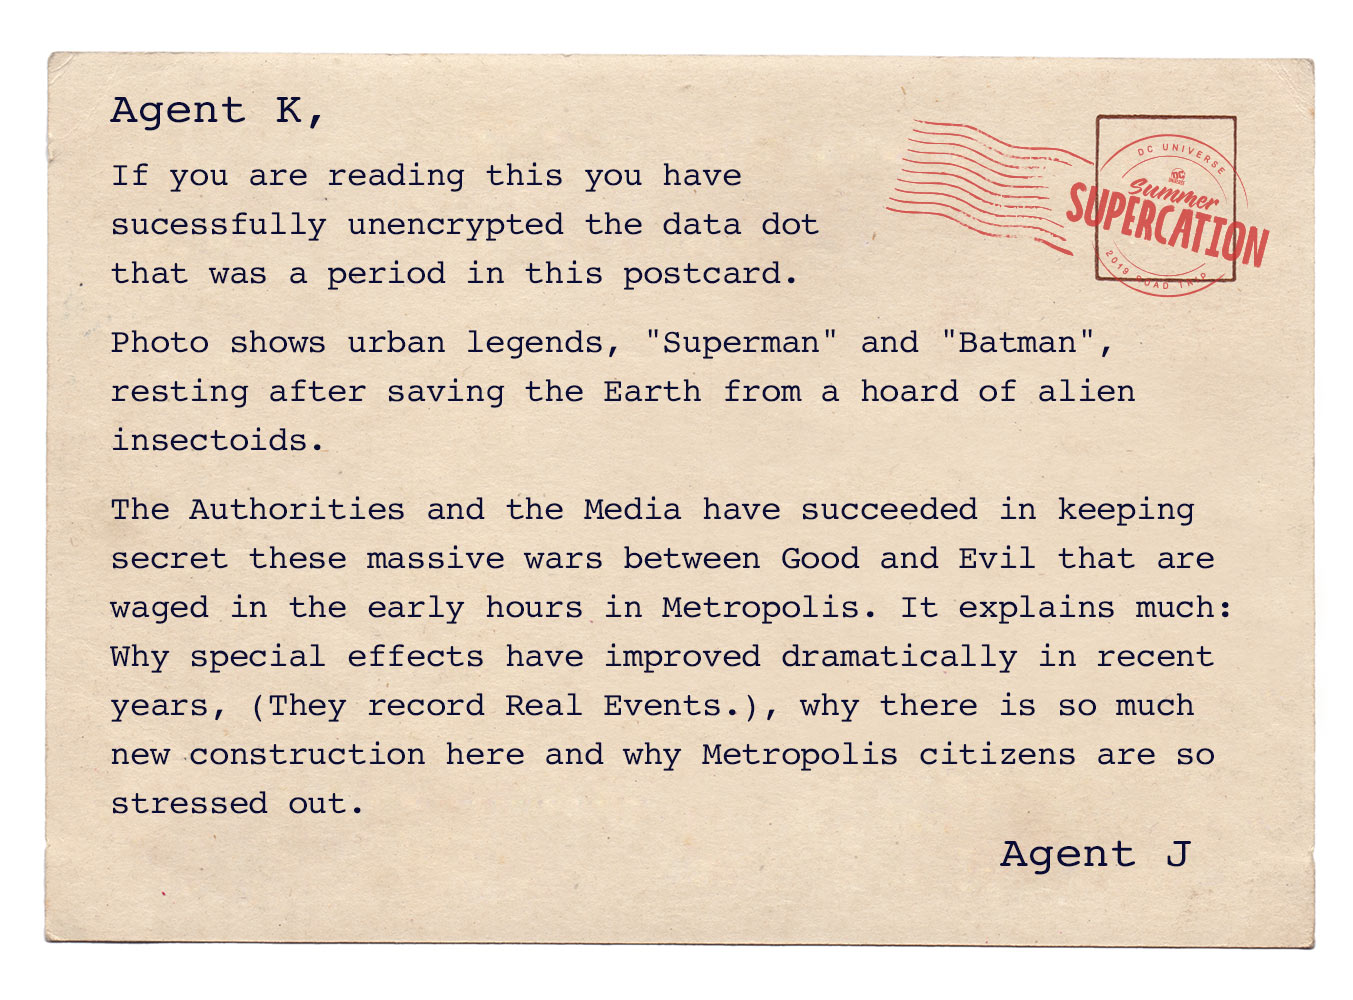 metropolis_postcards_190624_v1.jpg